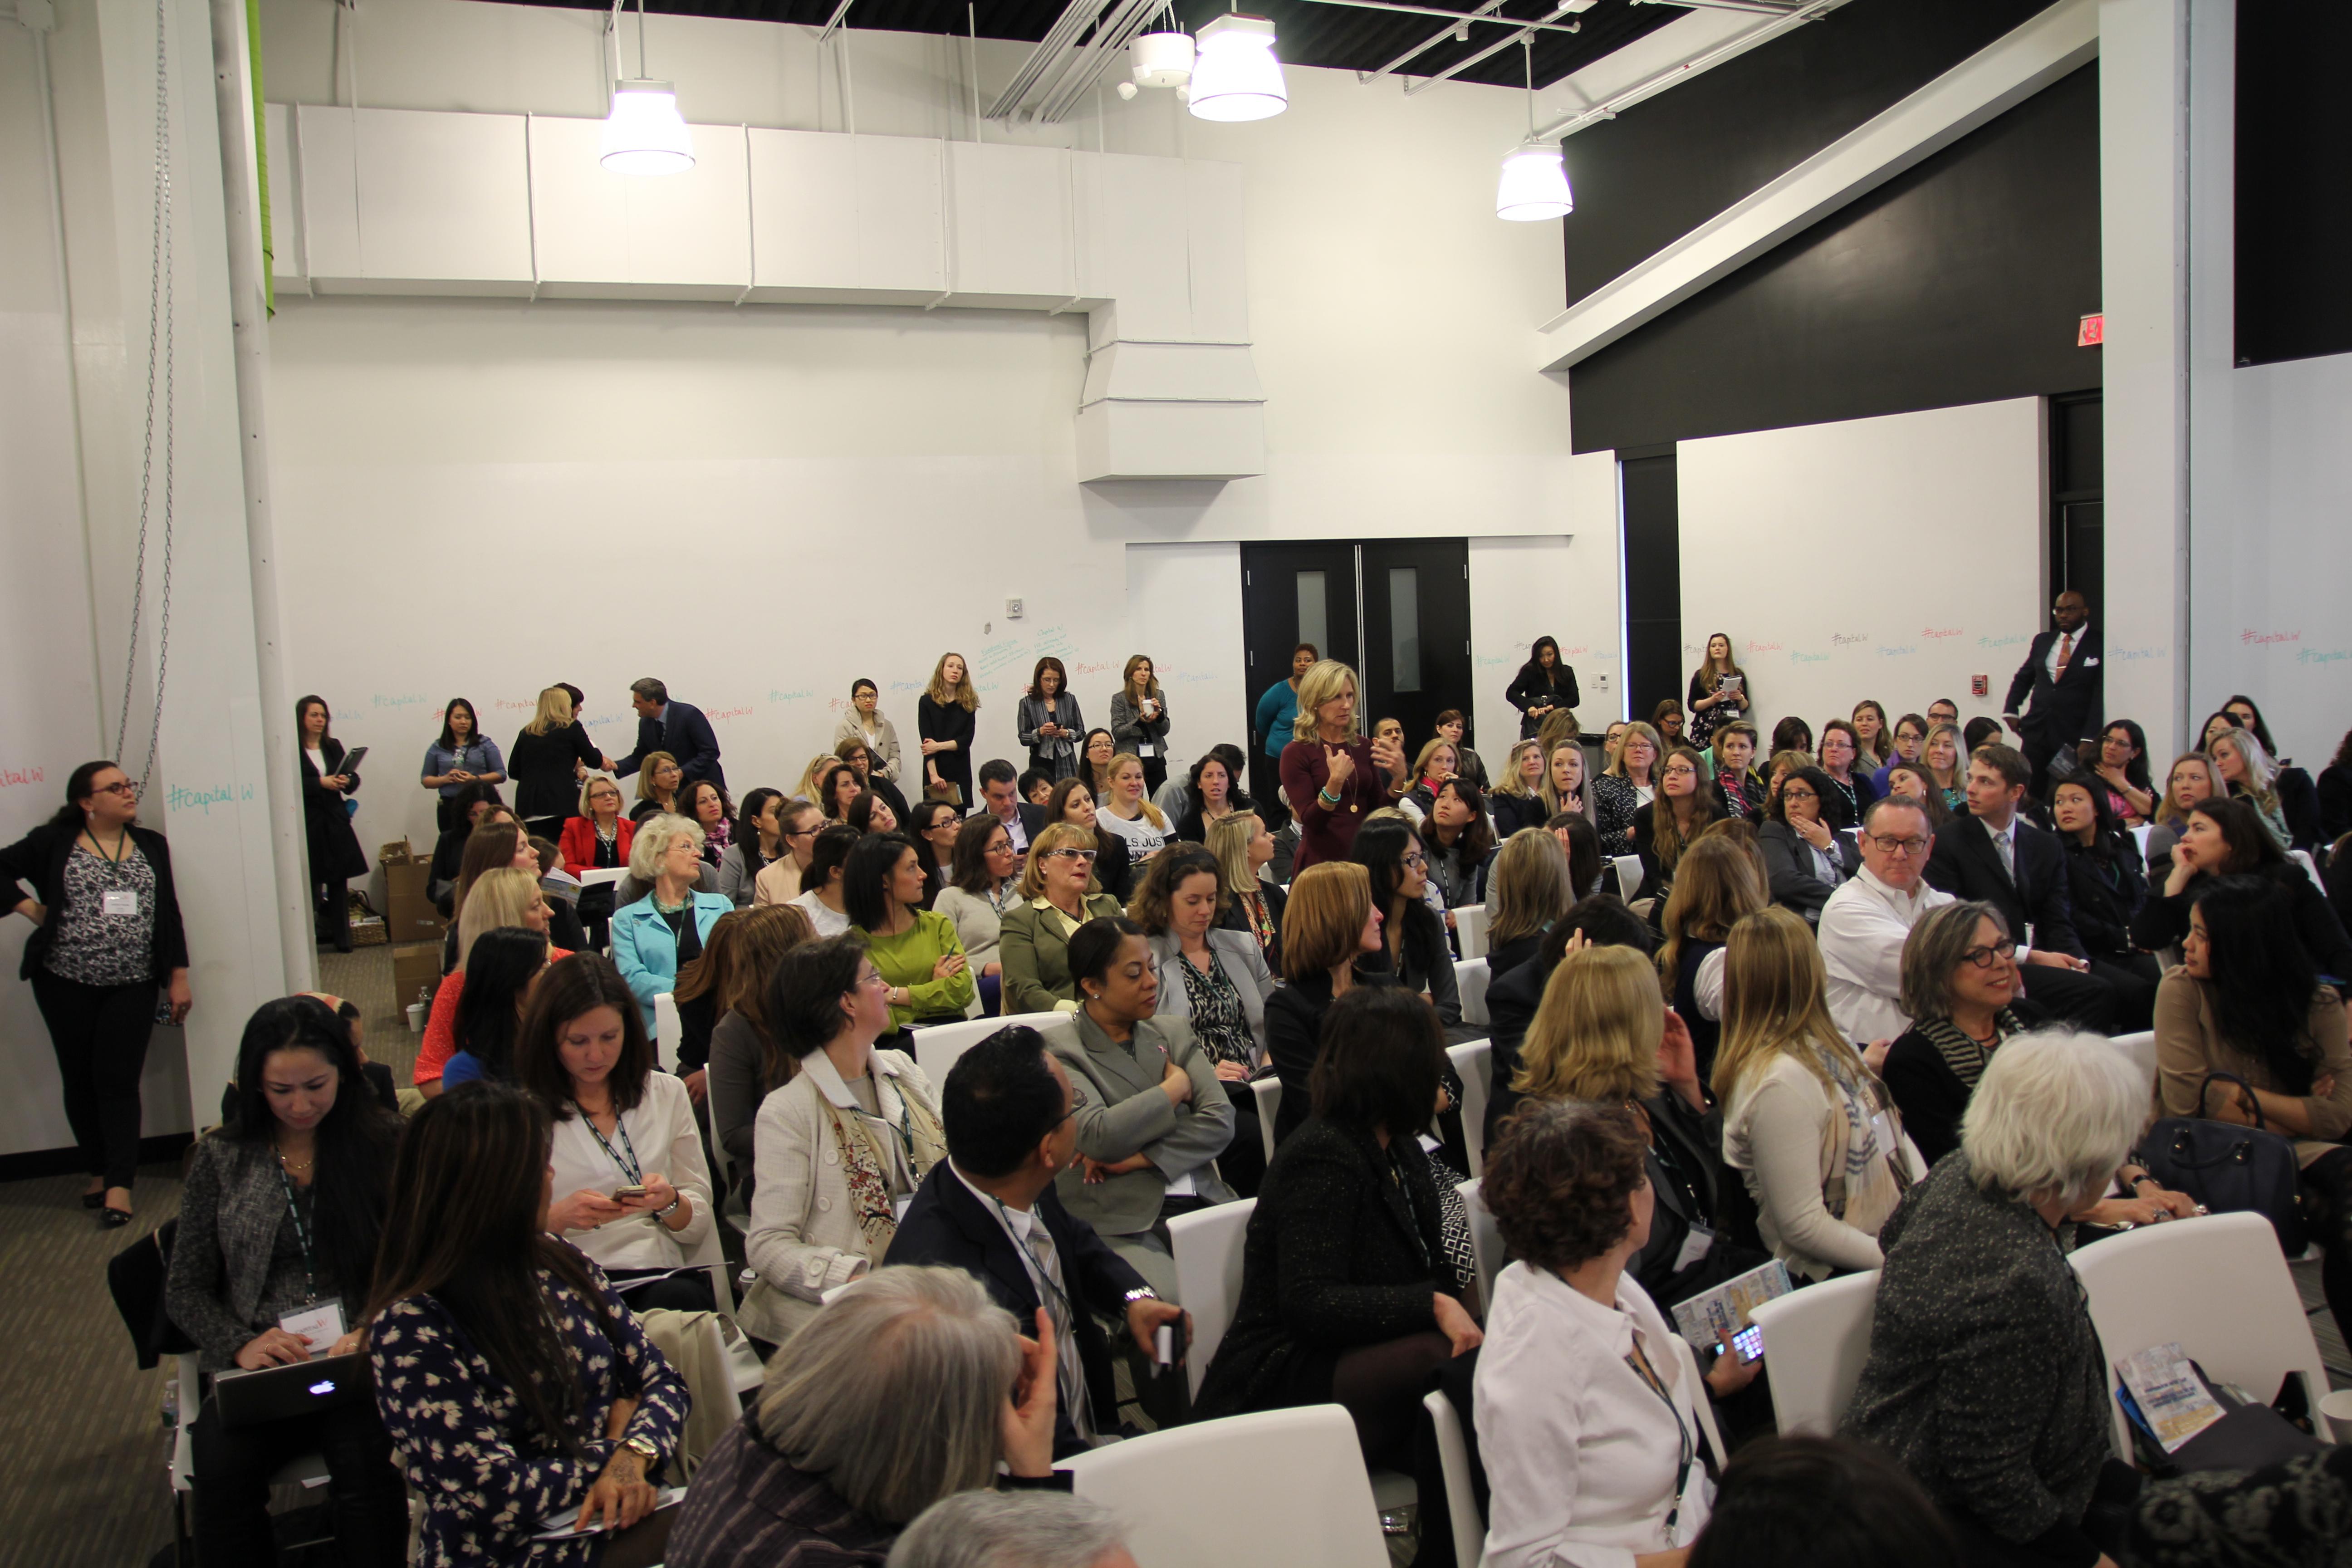 Aspiring female entrepreneurs and top investors gathered at the inaugural Boston Women's Venture Capital Summit.